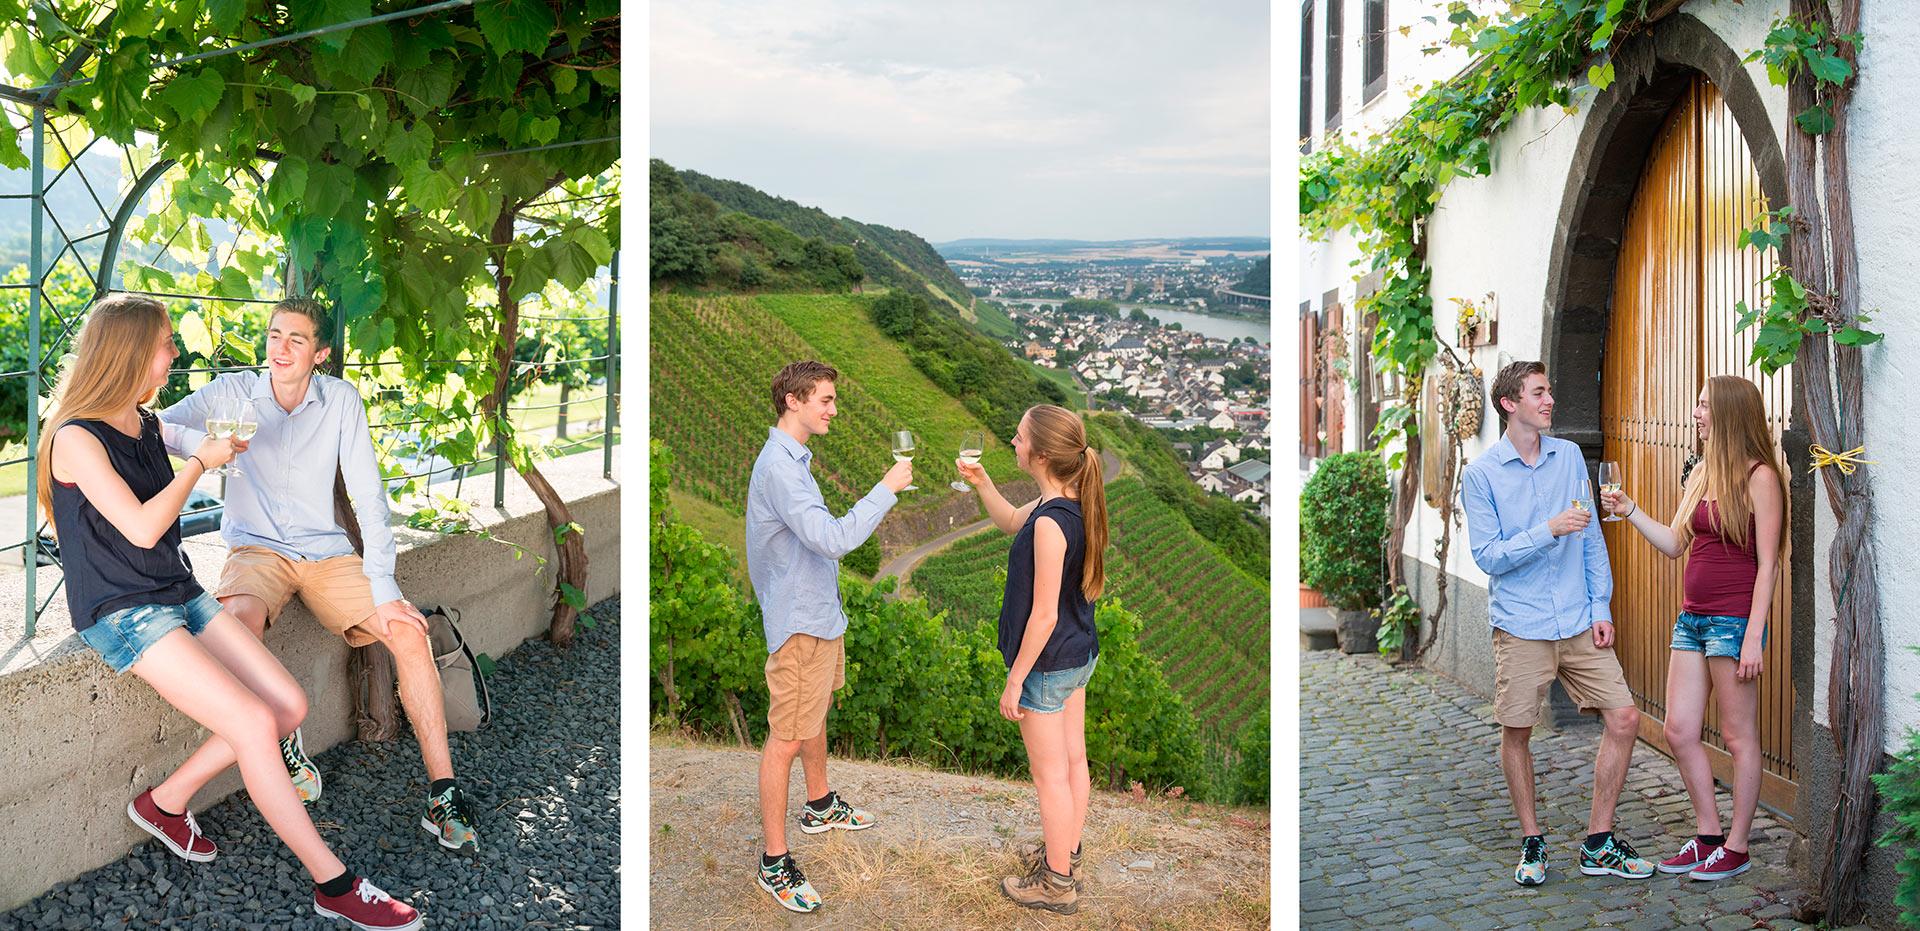 Leutesdorf-Wein-Fotograf